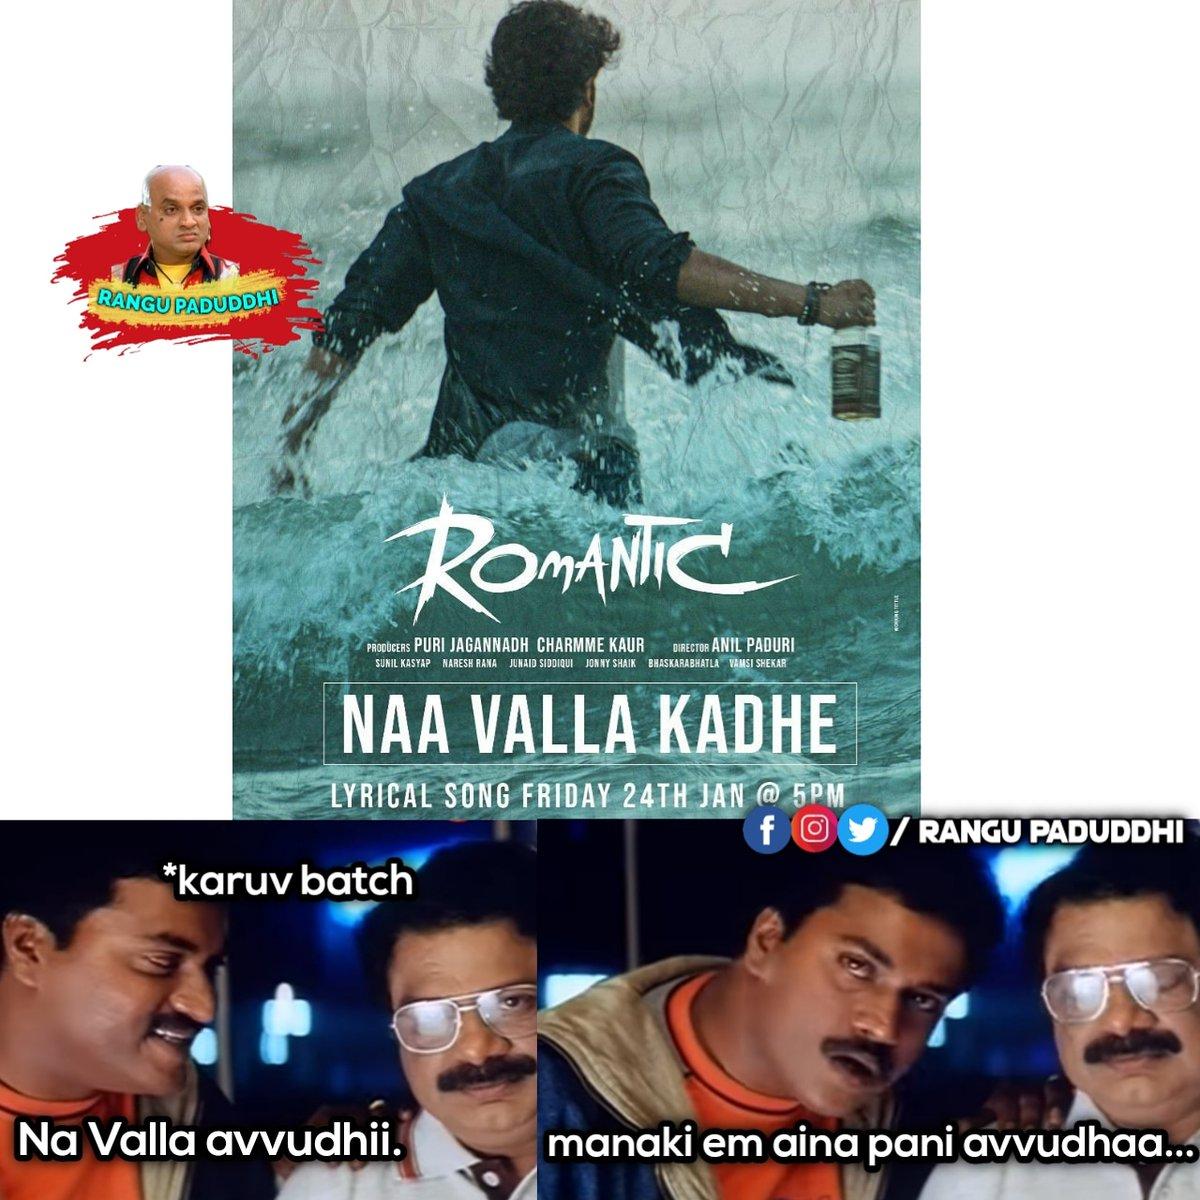 For more fun Do follow - @rangu_paduddhi #rangupaduddhi #comedy #fun #memes #memesdaily #telugumemes #trolls #telugumeme #telugucomedy #btech #babunuvvubtechah #btechlife  #vijaydevarakondafc  #alavaikunthapurramuloo #meme #memes2019 #memespic.twitter.com/LP6b2zSzrC